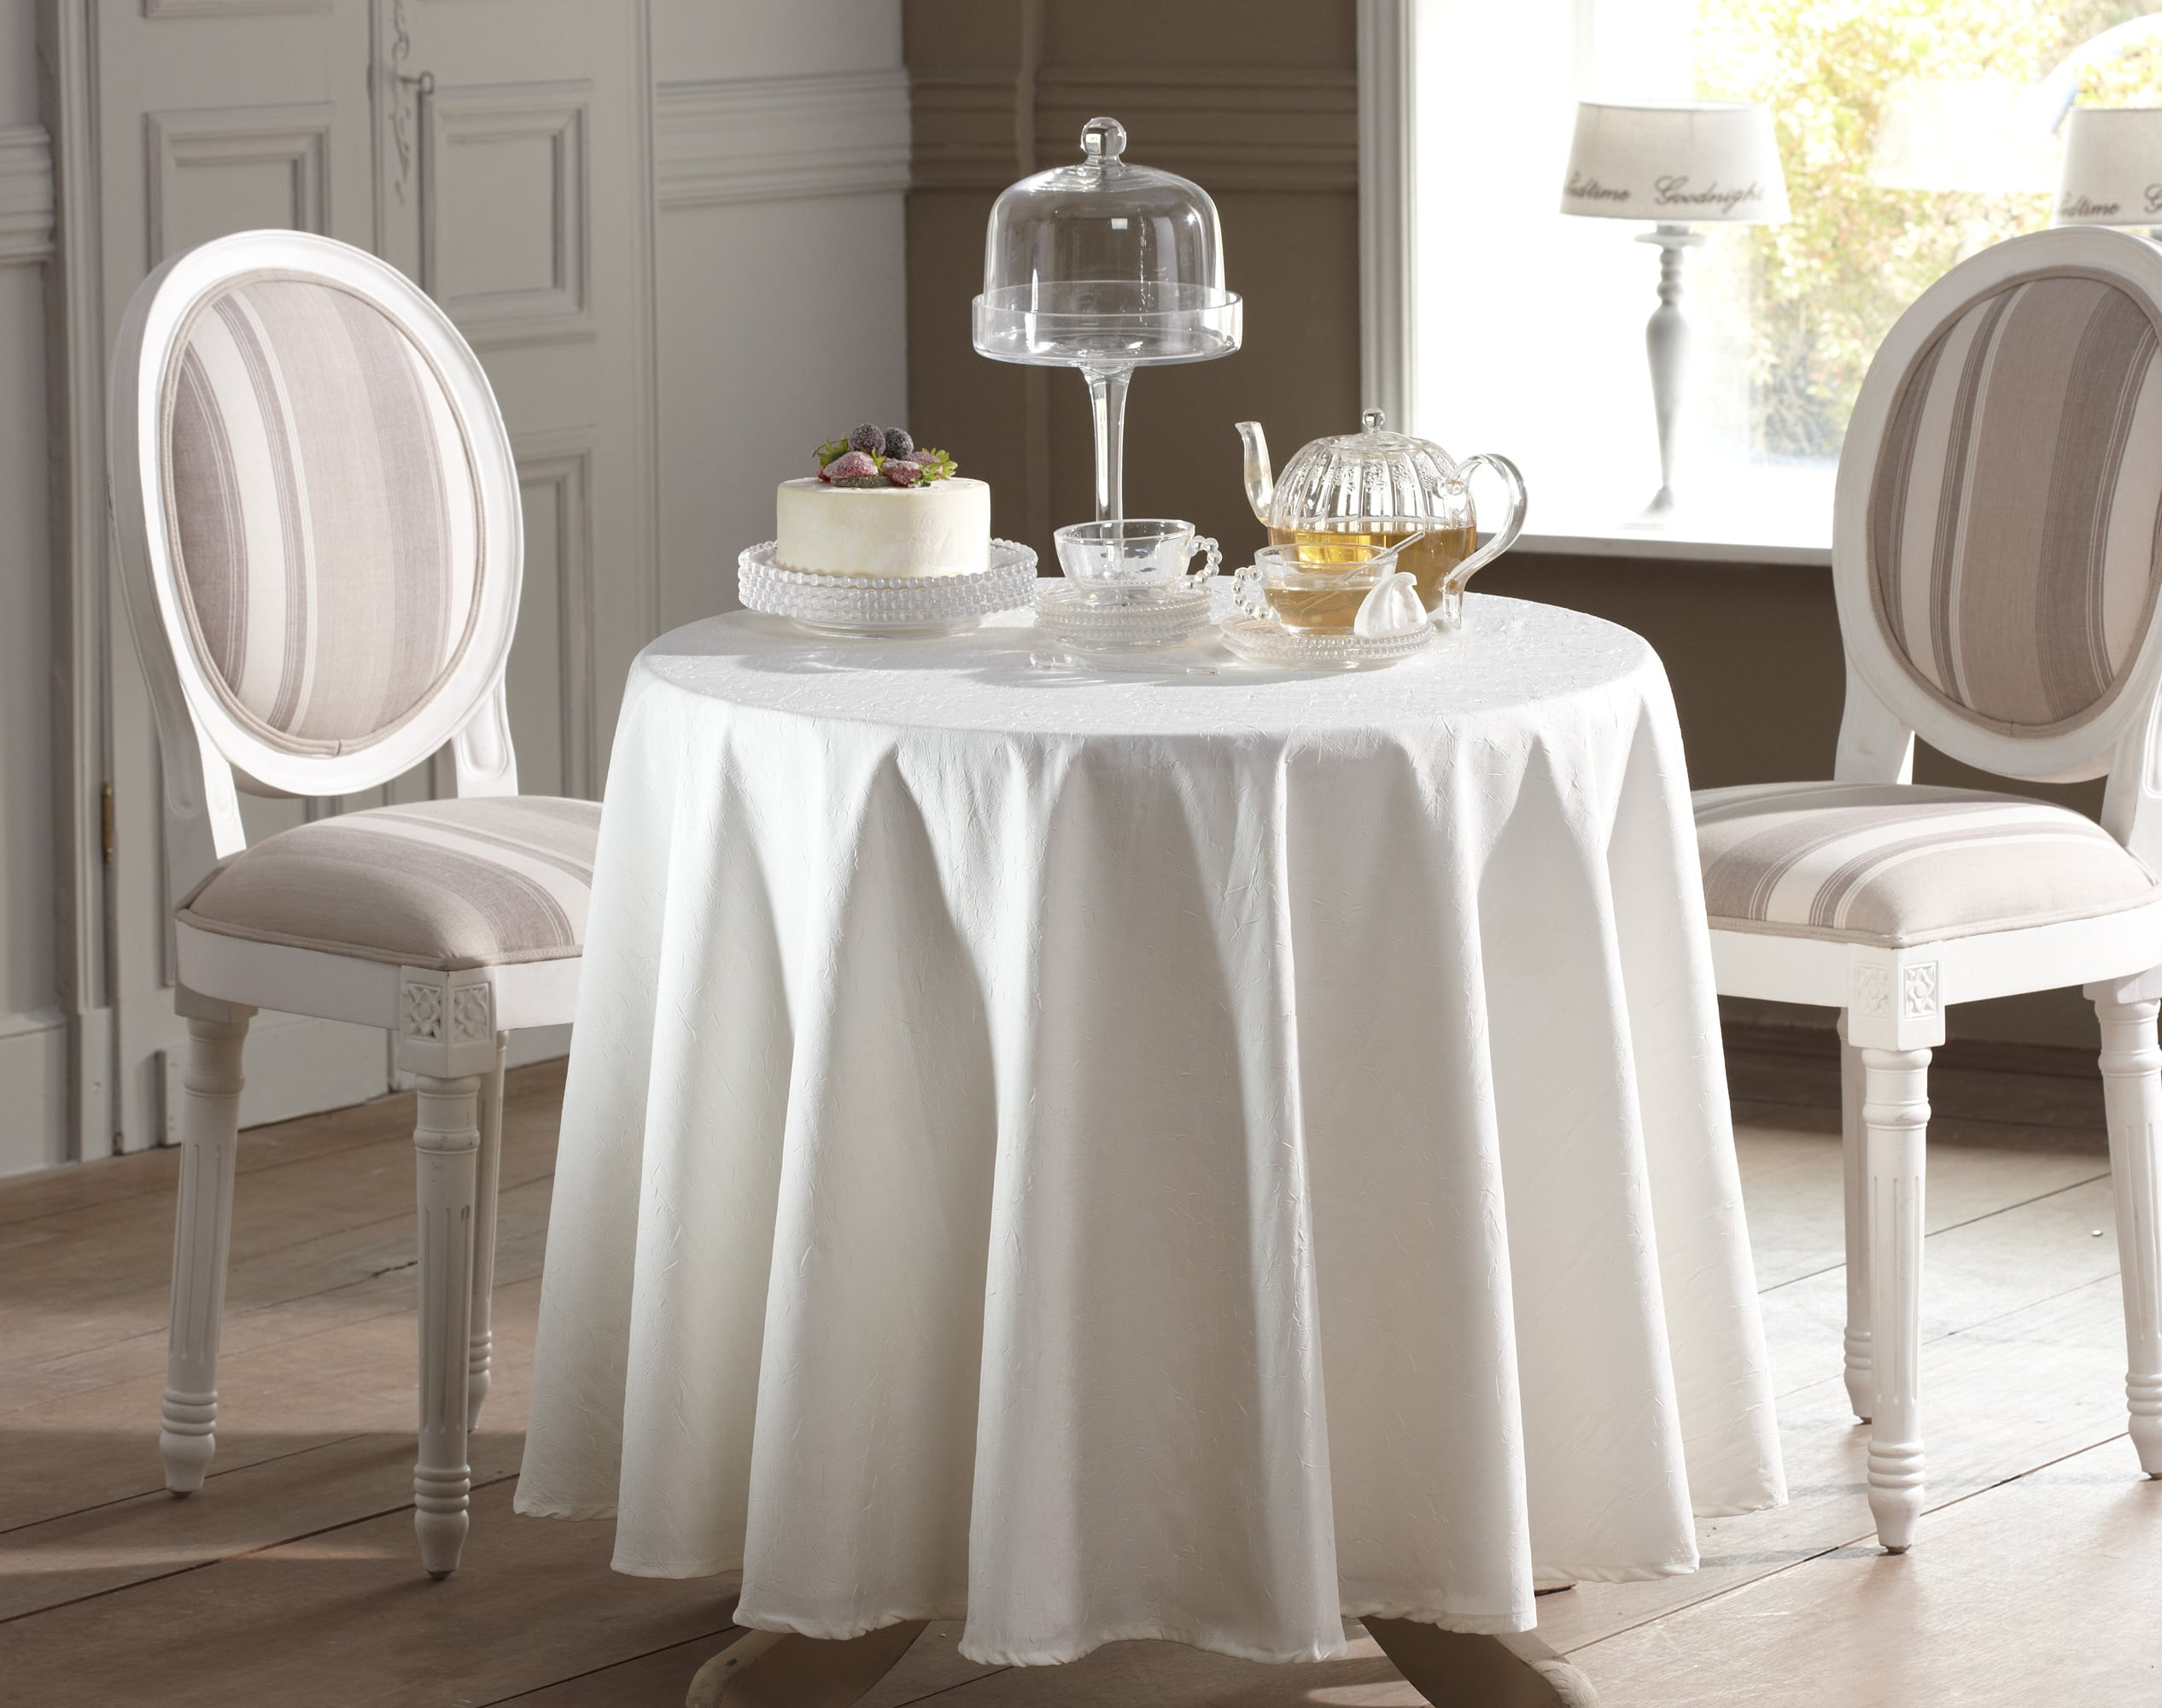 Nappe Ronde blanc en polyester 180x180